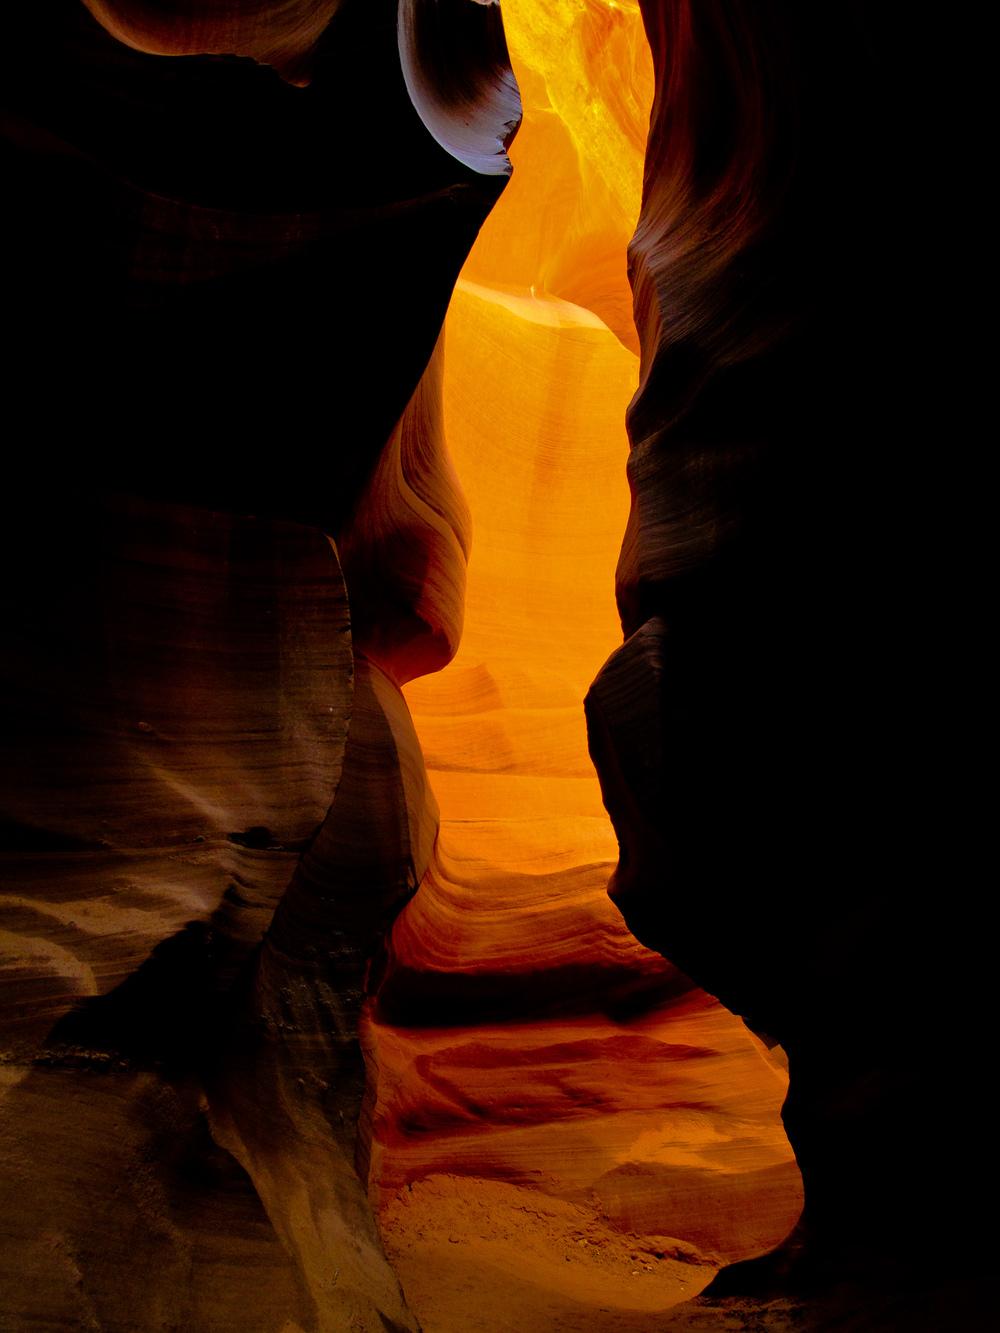 Arizona_Travel_039.JPG